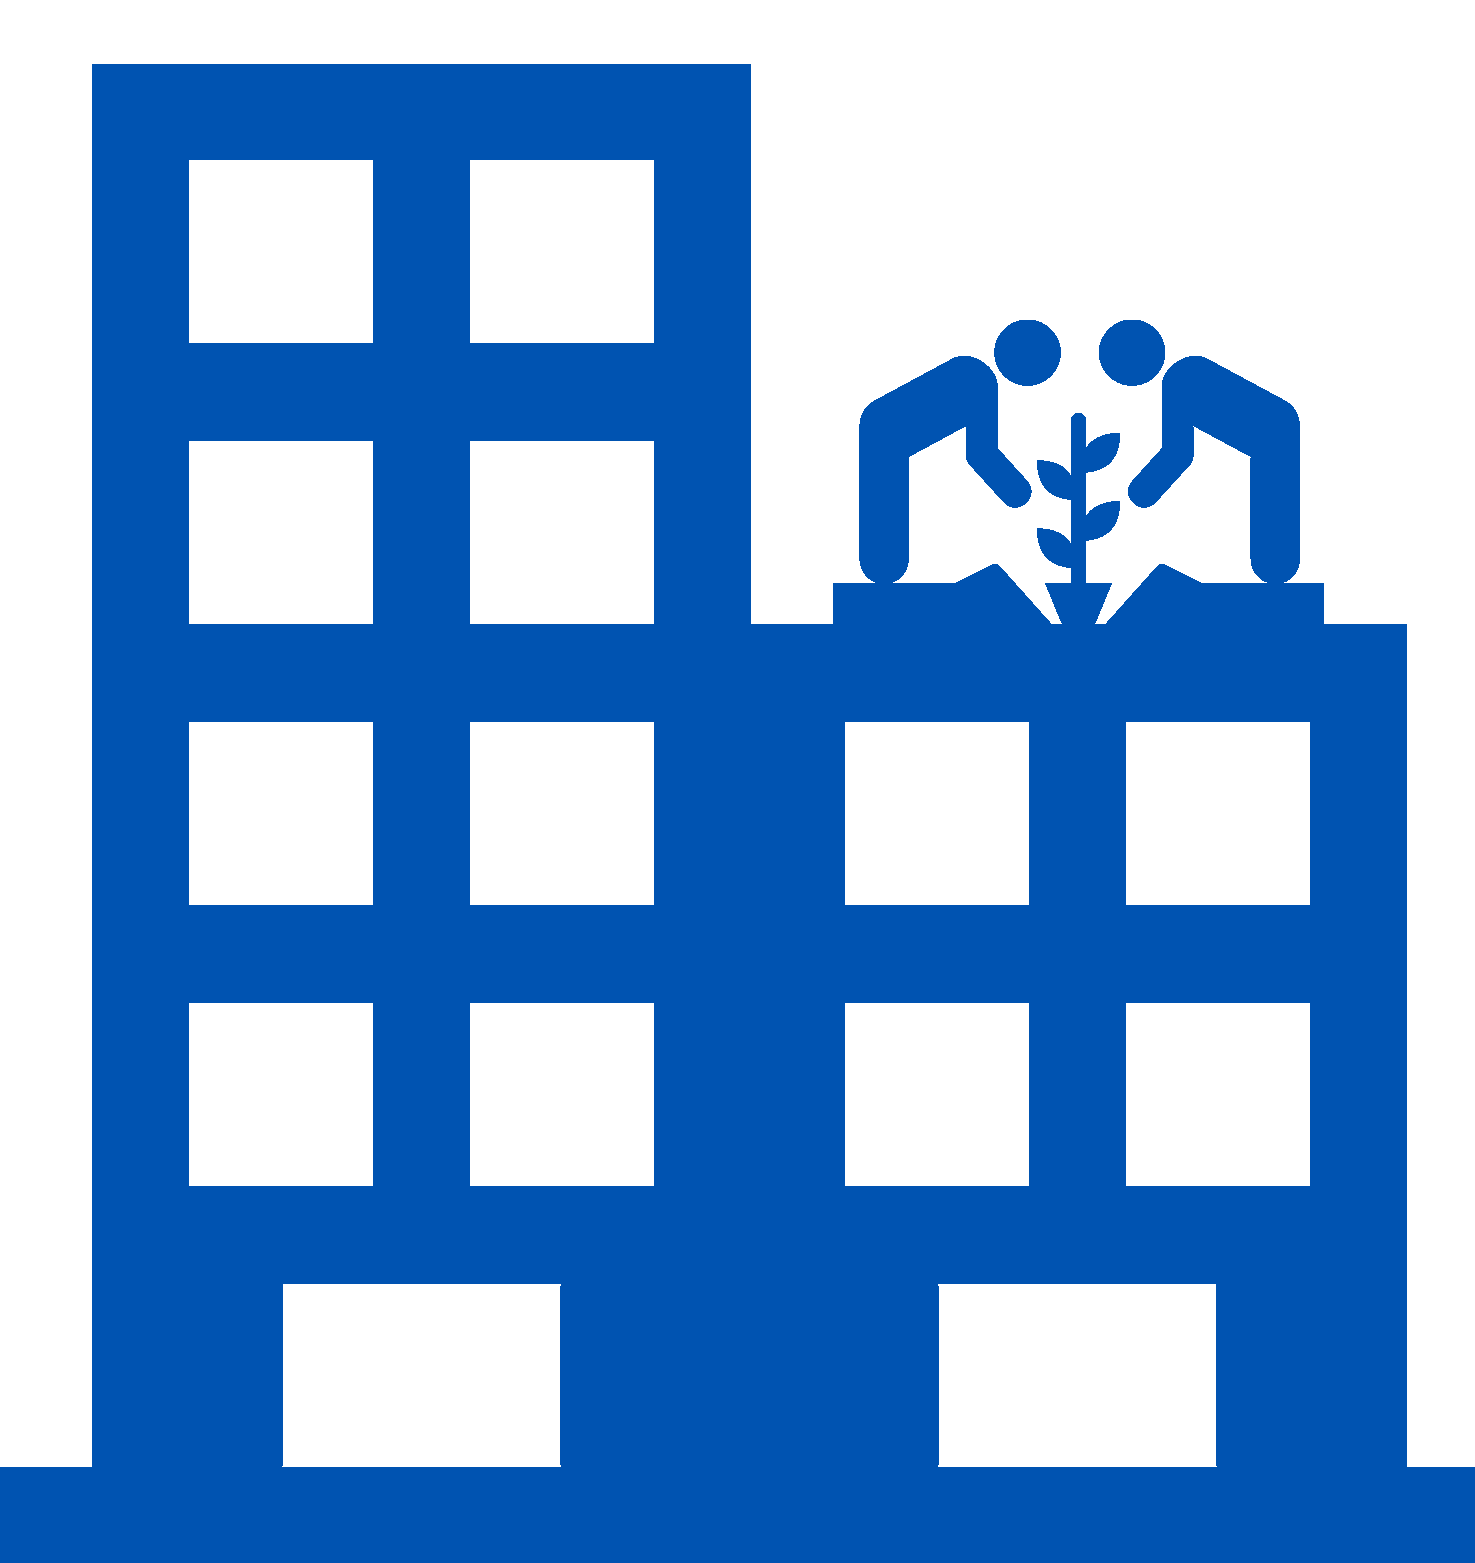 Roof garden icon